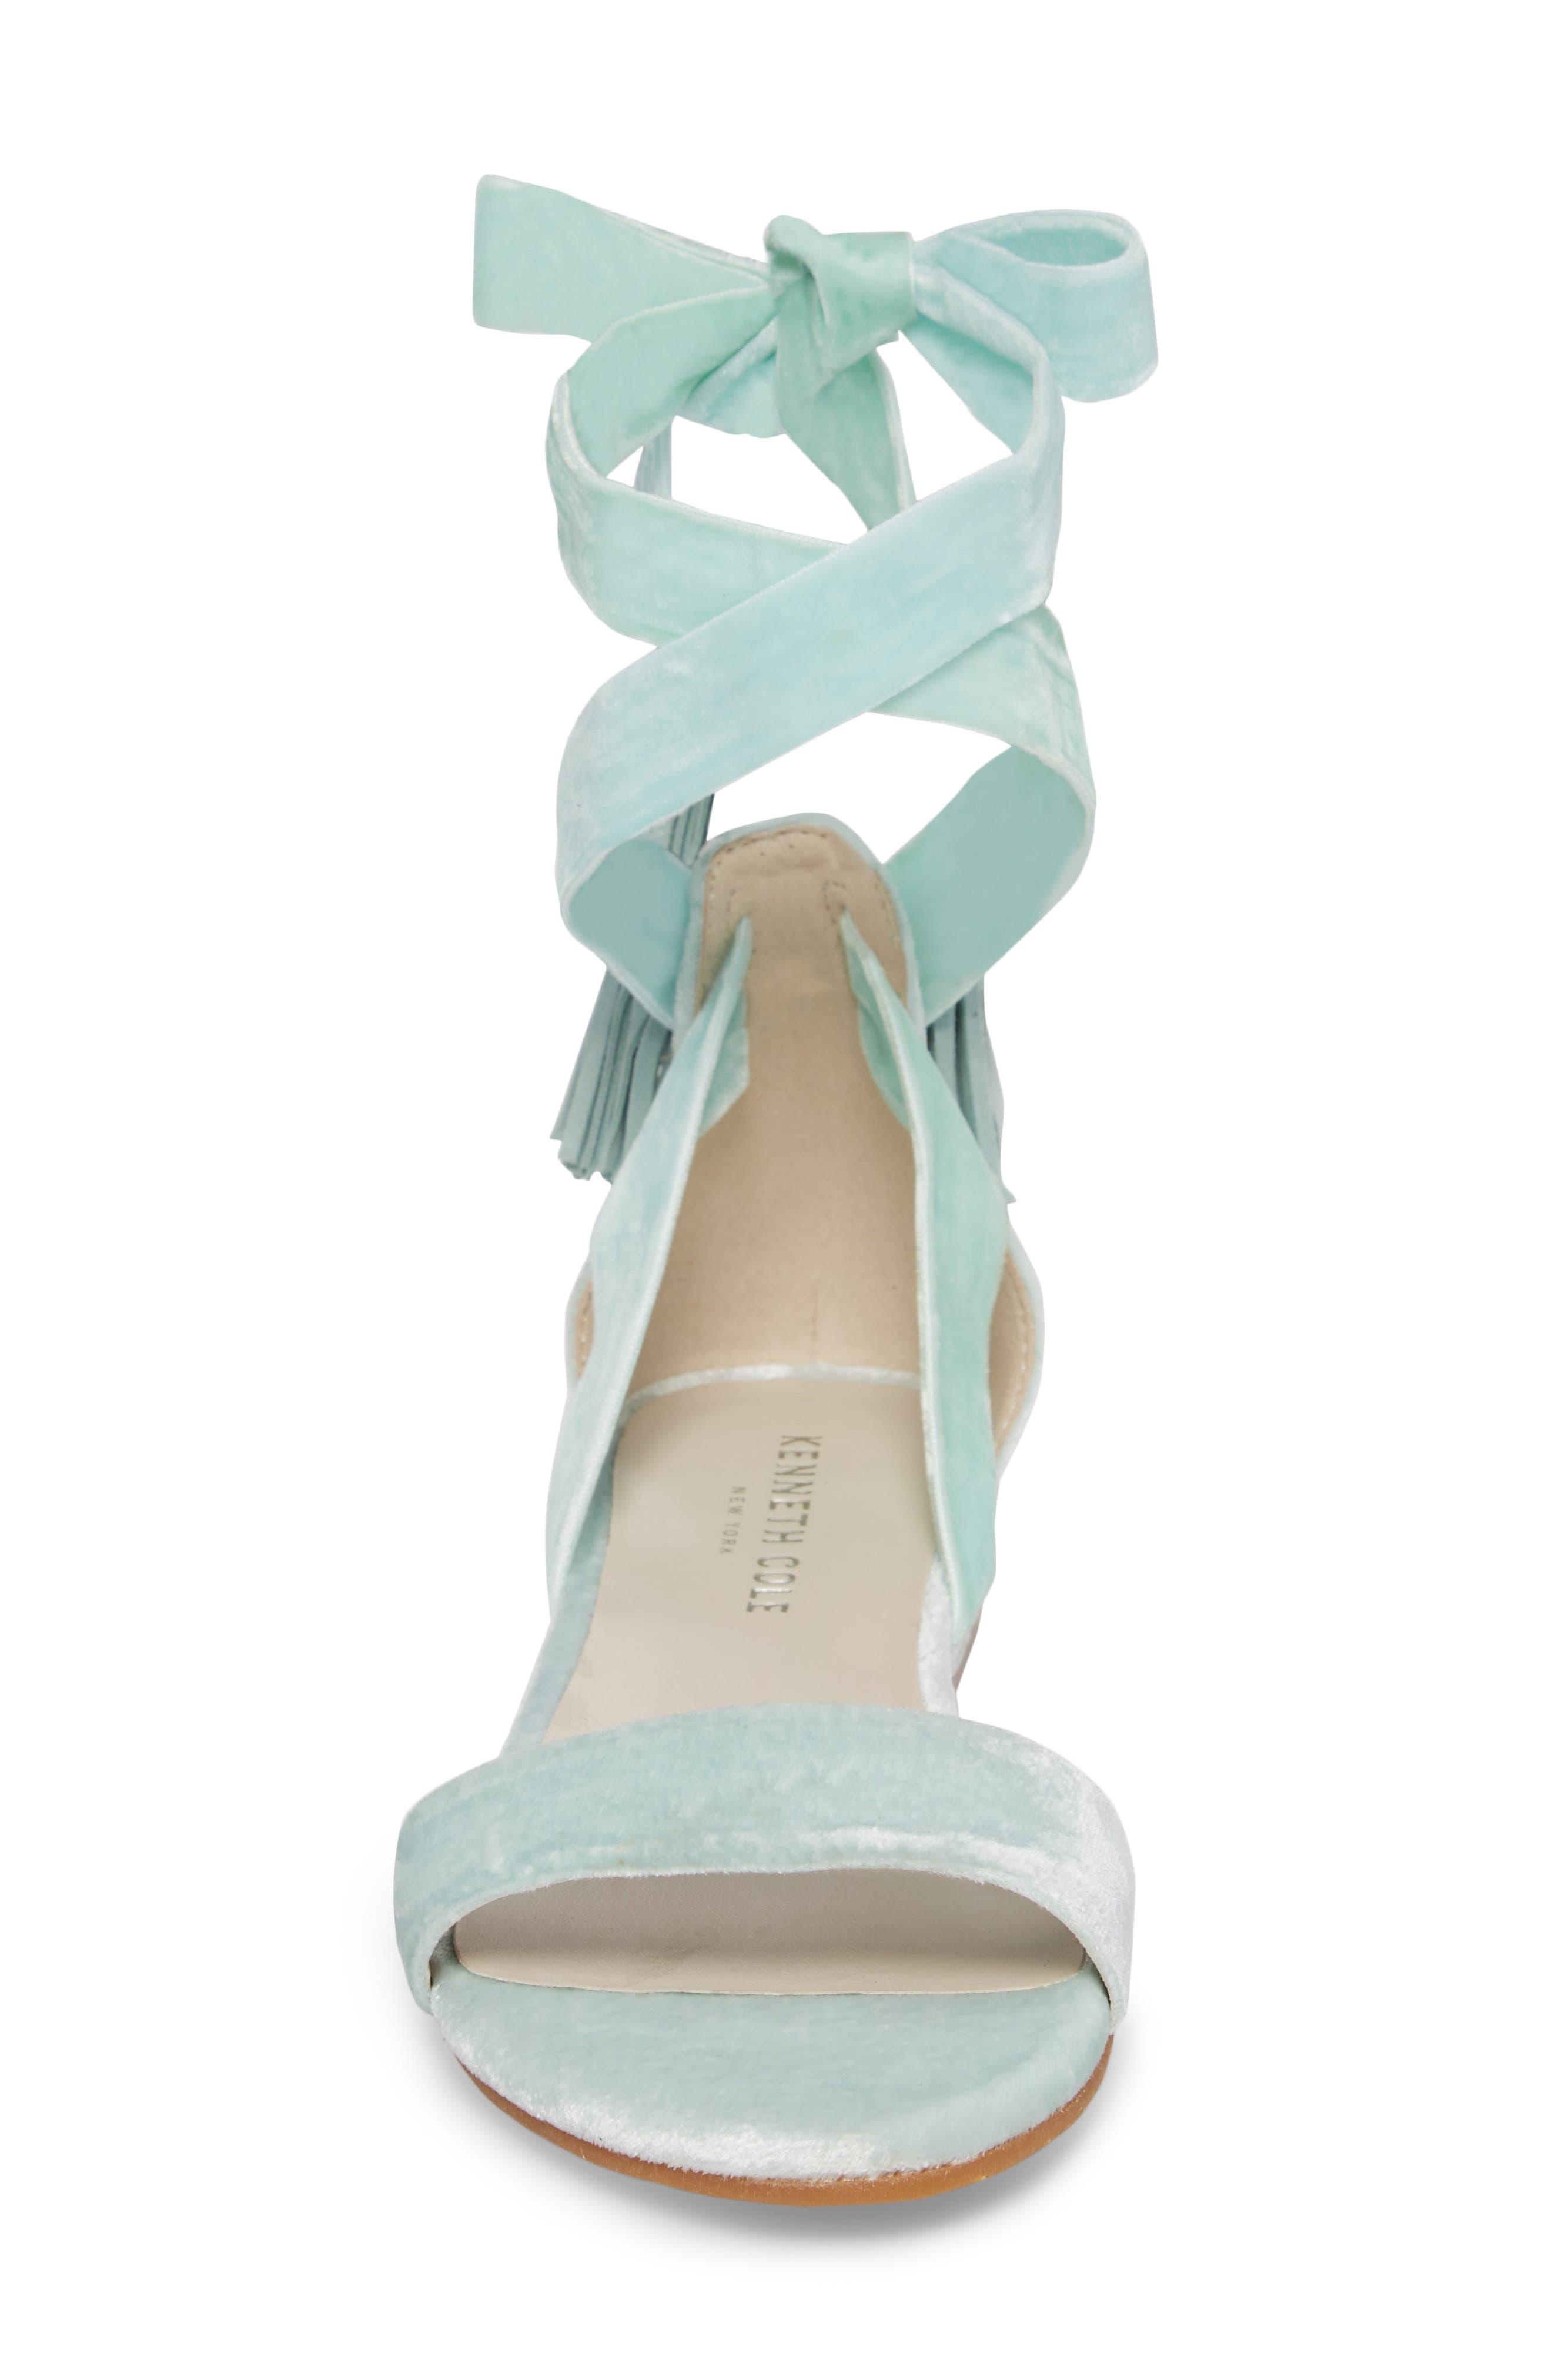 Valen Tassel Lace-Up Sandal,                             Alternate thumbnail 50, color,